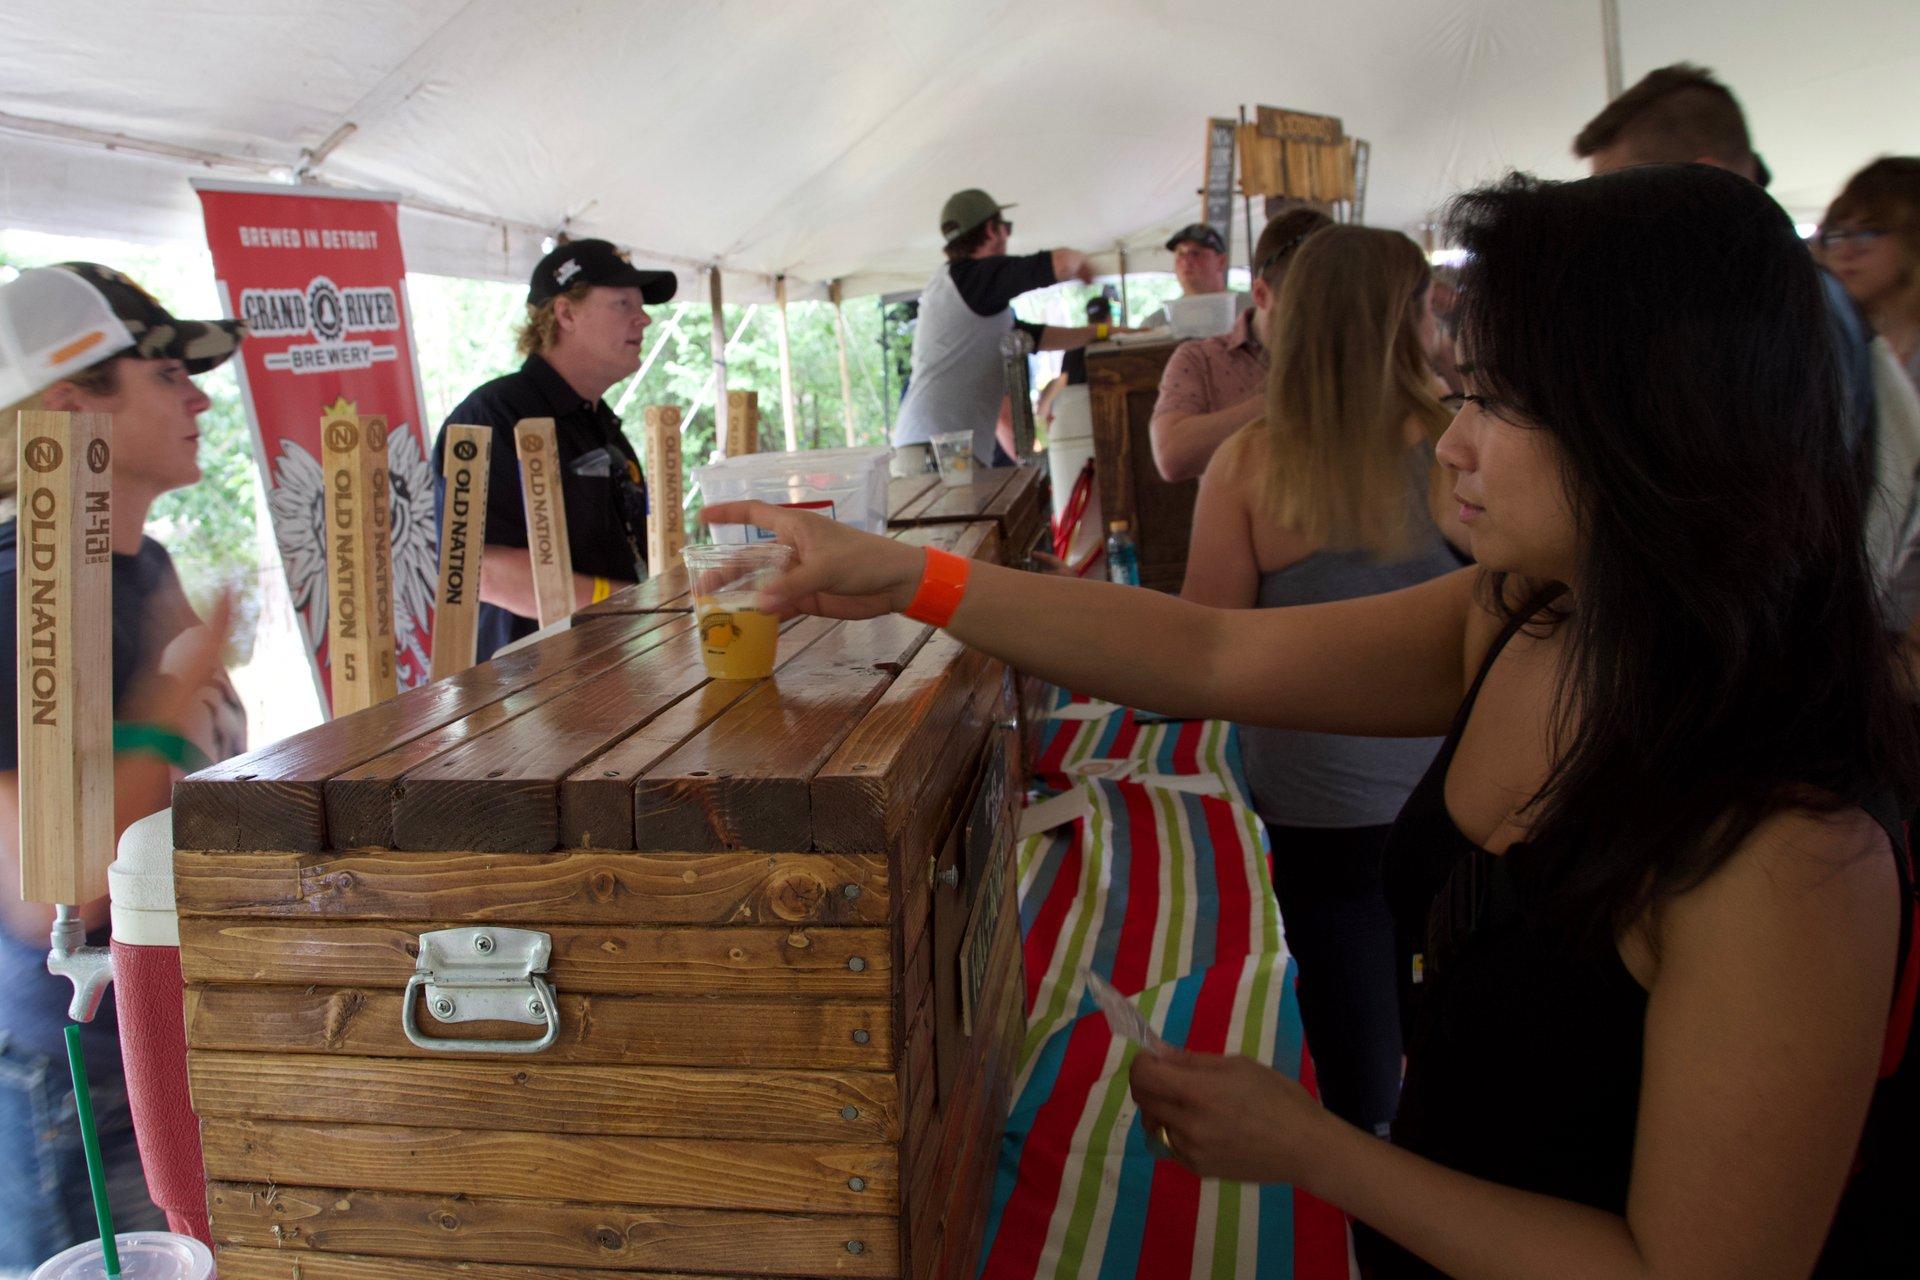 Michigan Summer Beer Festival in Midwest - Best Season 2020